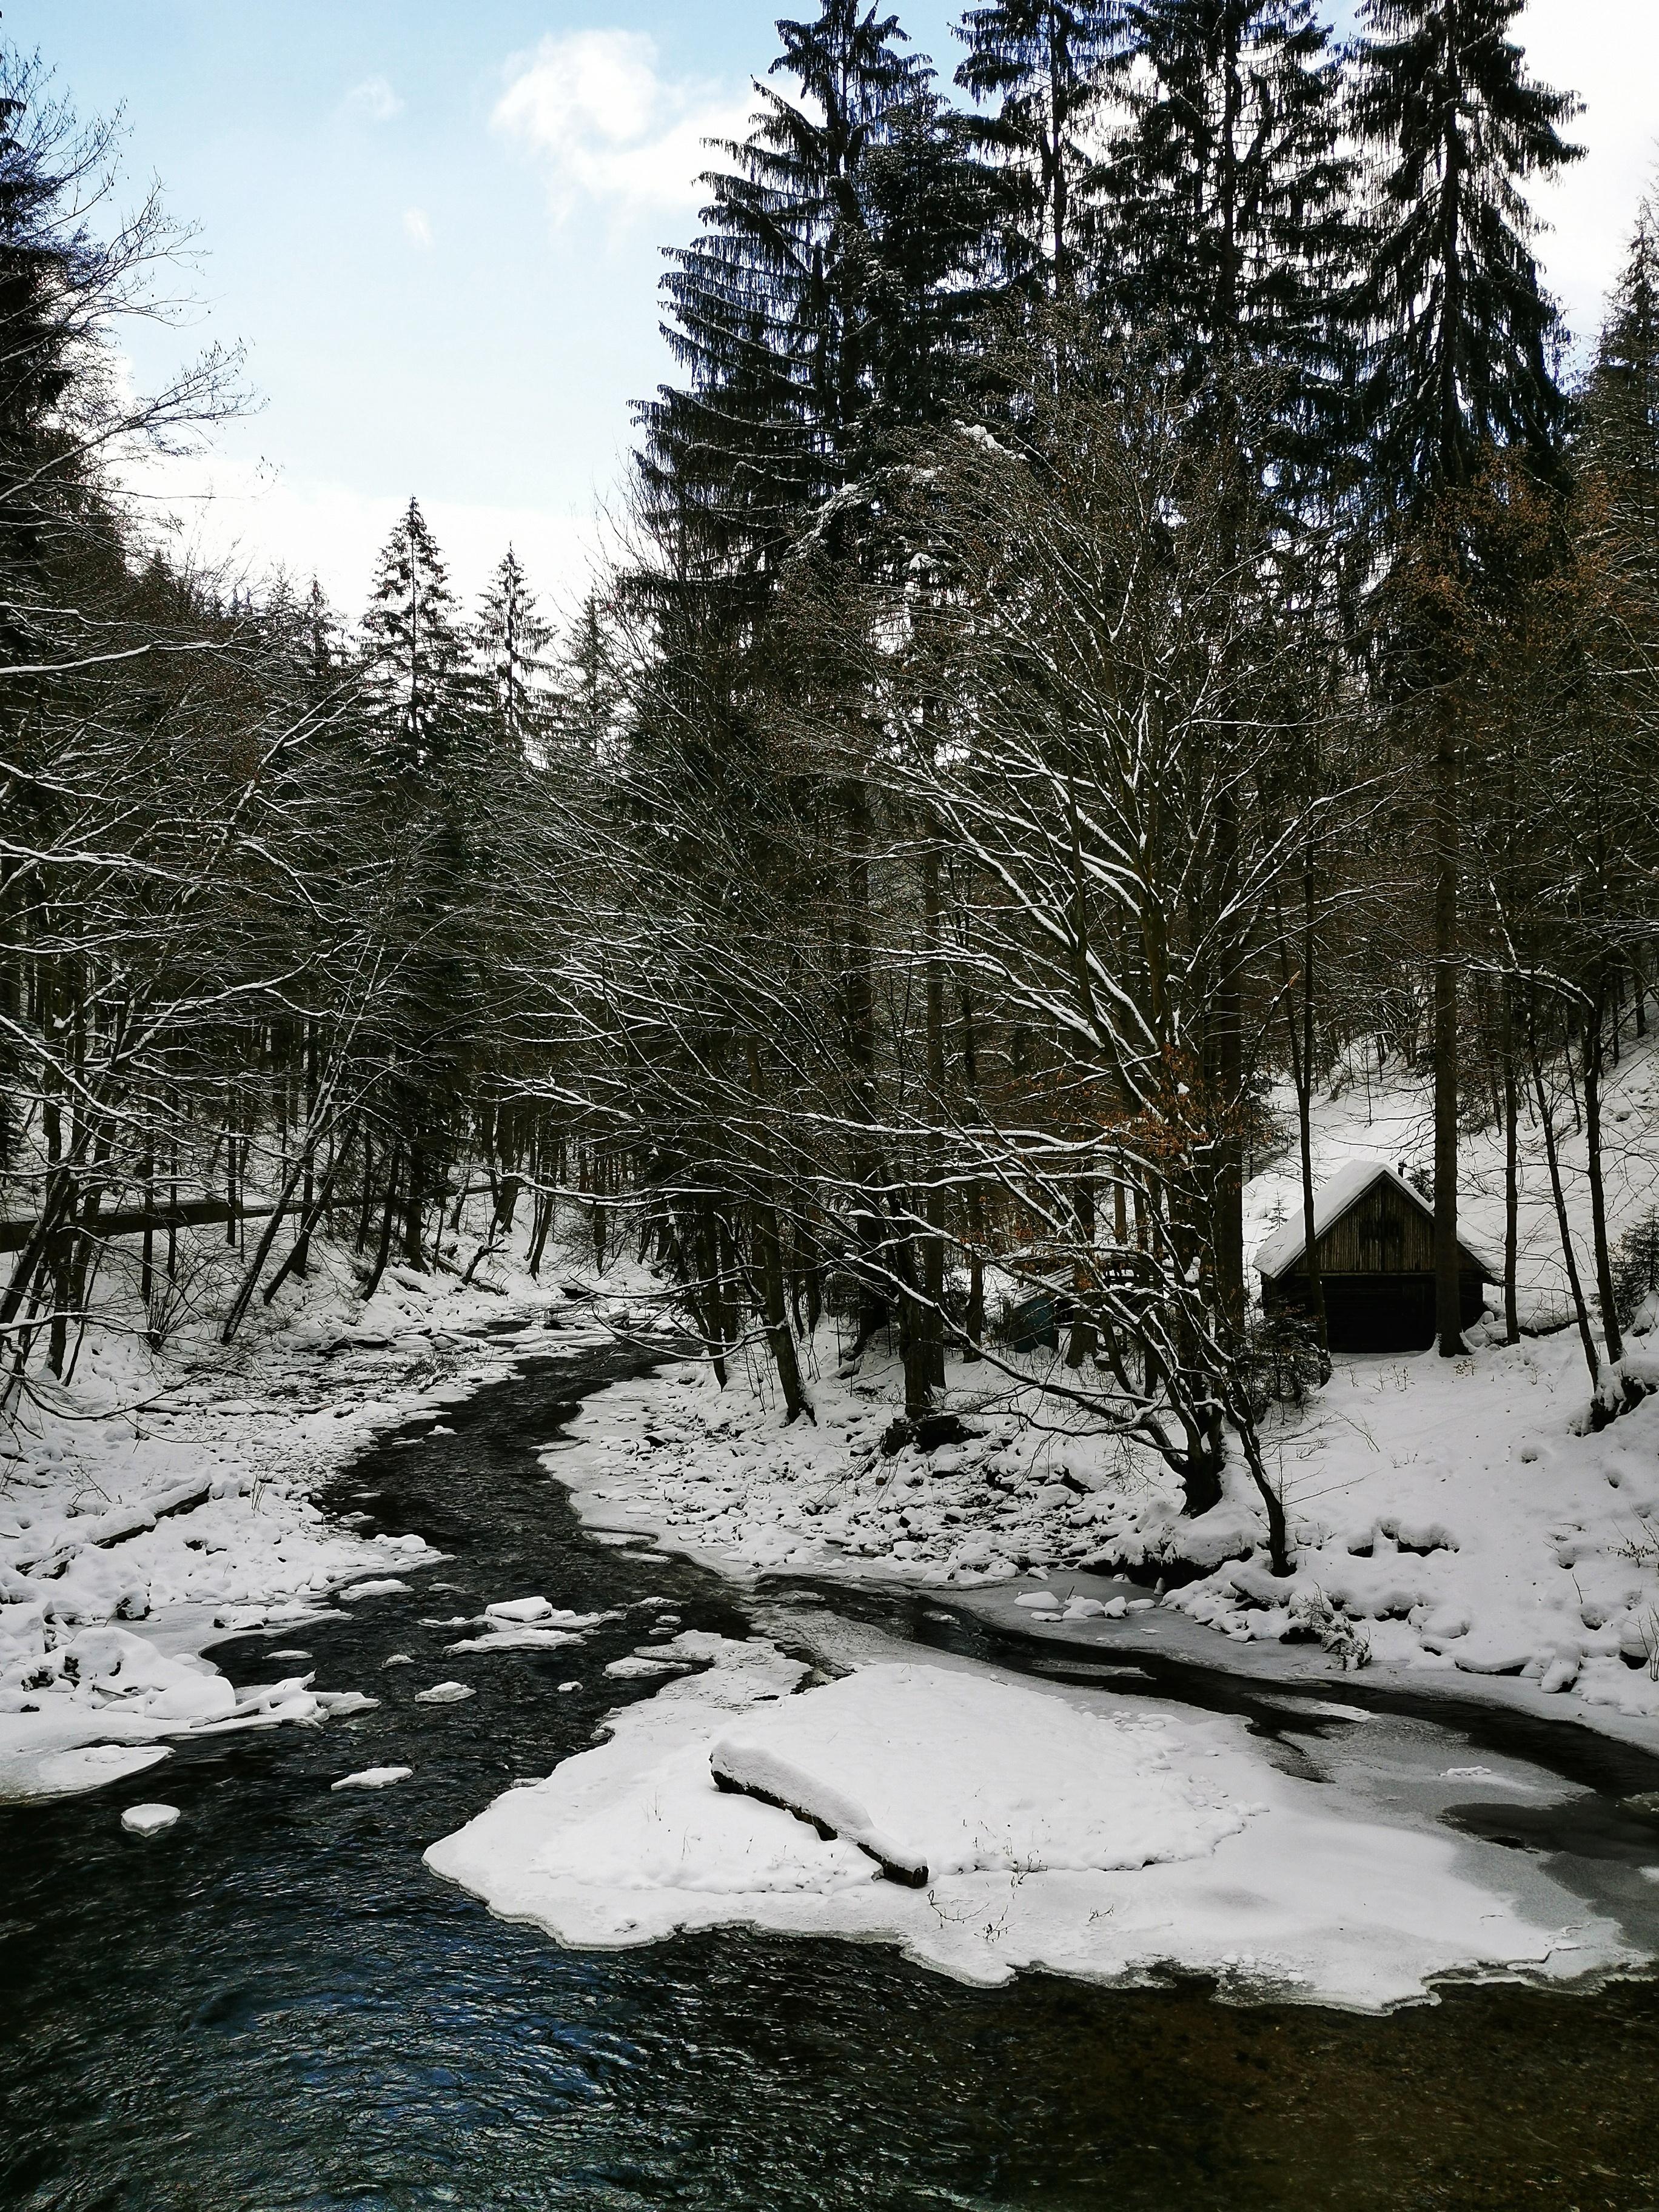 Kamenice river, Czech Republic